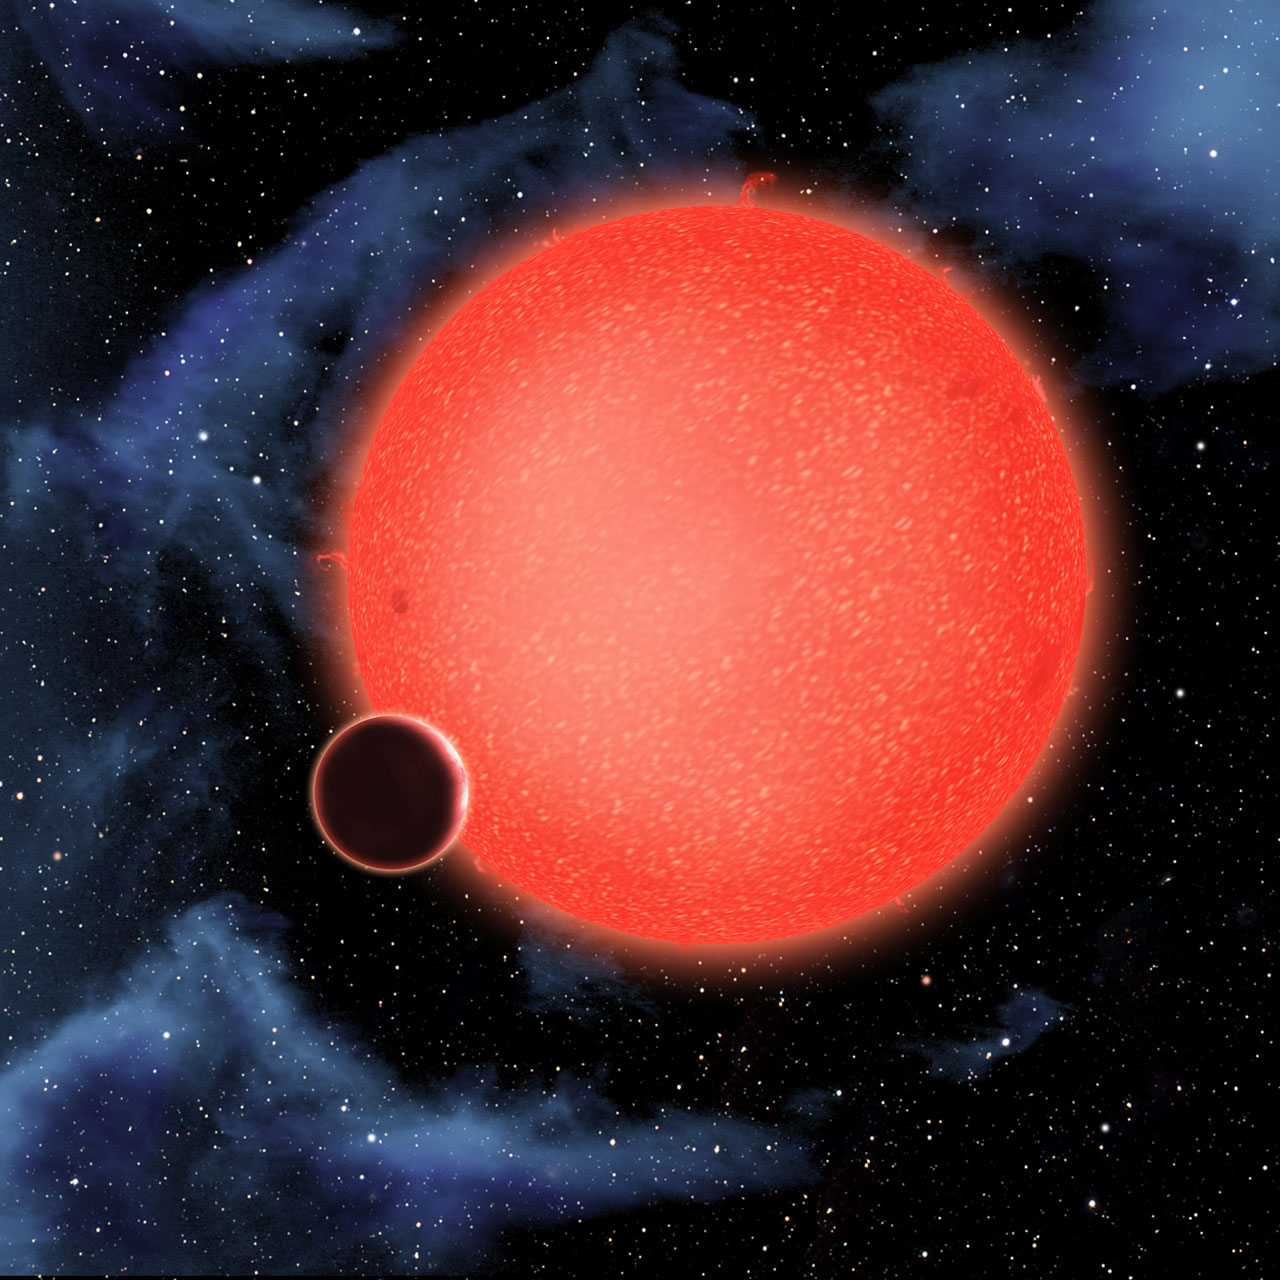 Hubble reveals a new class of extrasolar planet   ESA/Hubble